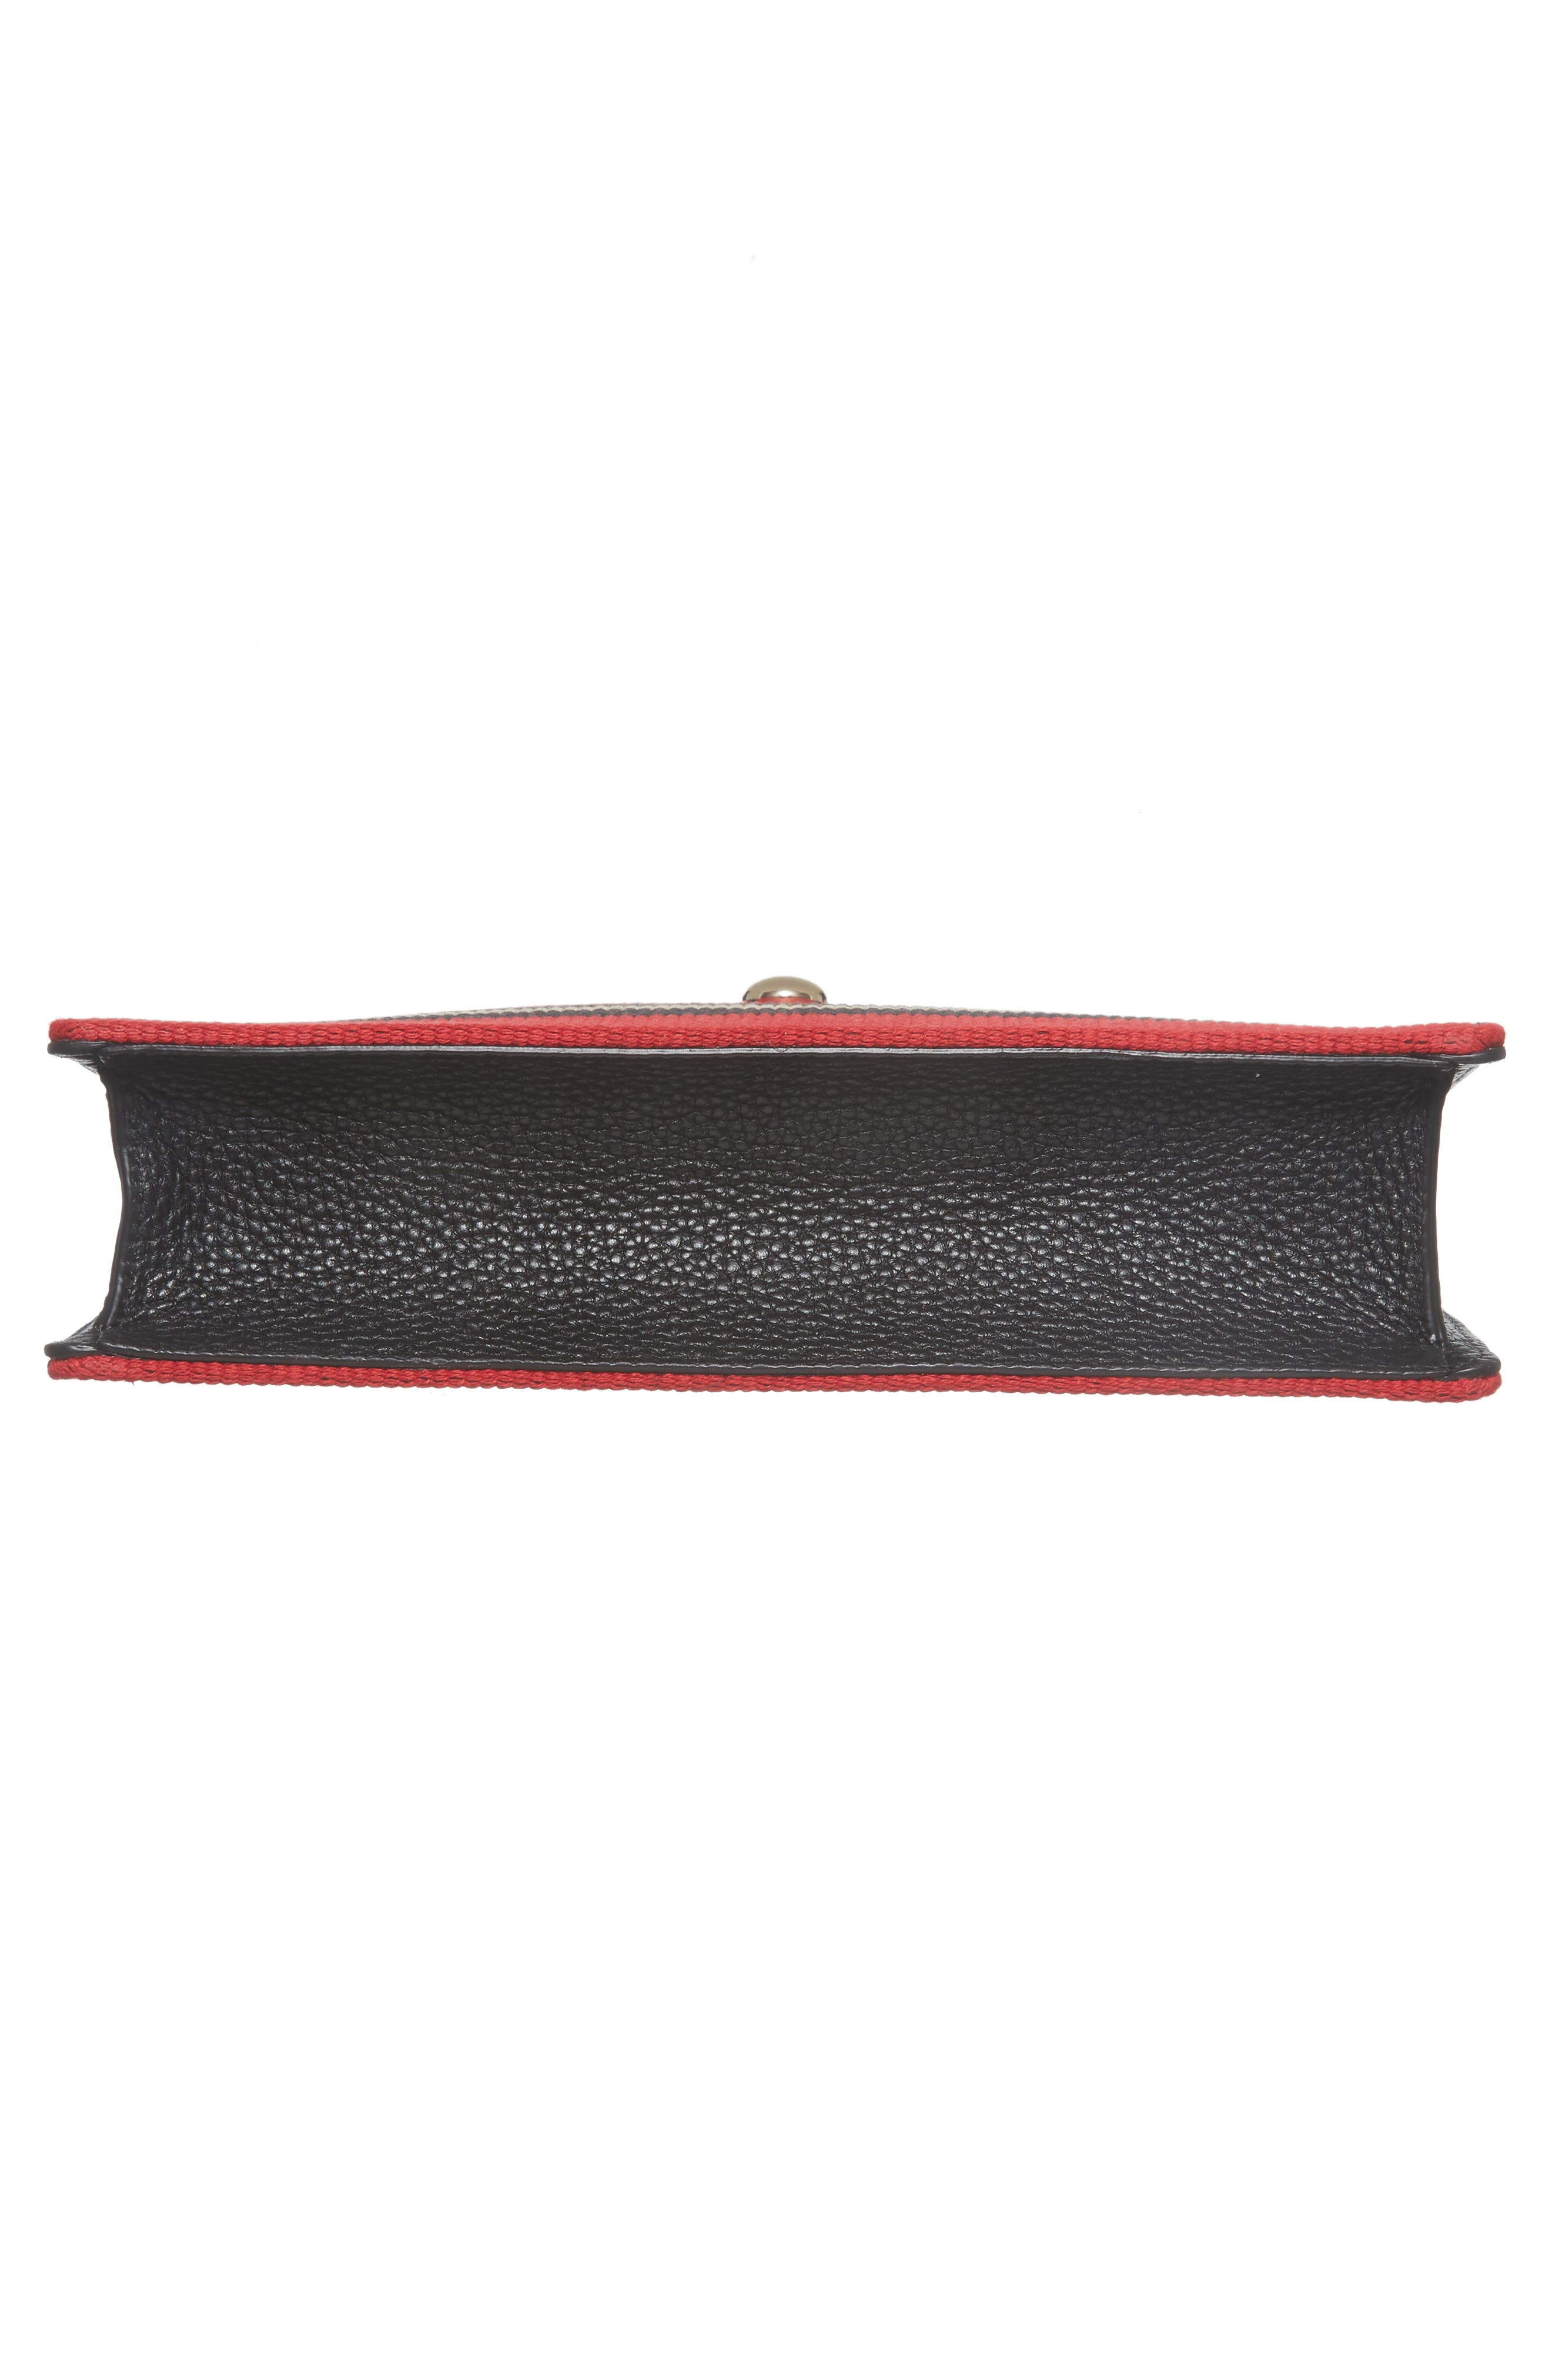 steward street clarise grosgrain stripe shoulder bag,                             Alternate thumbnail 6, color,                             600